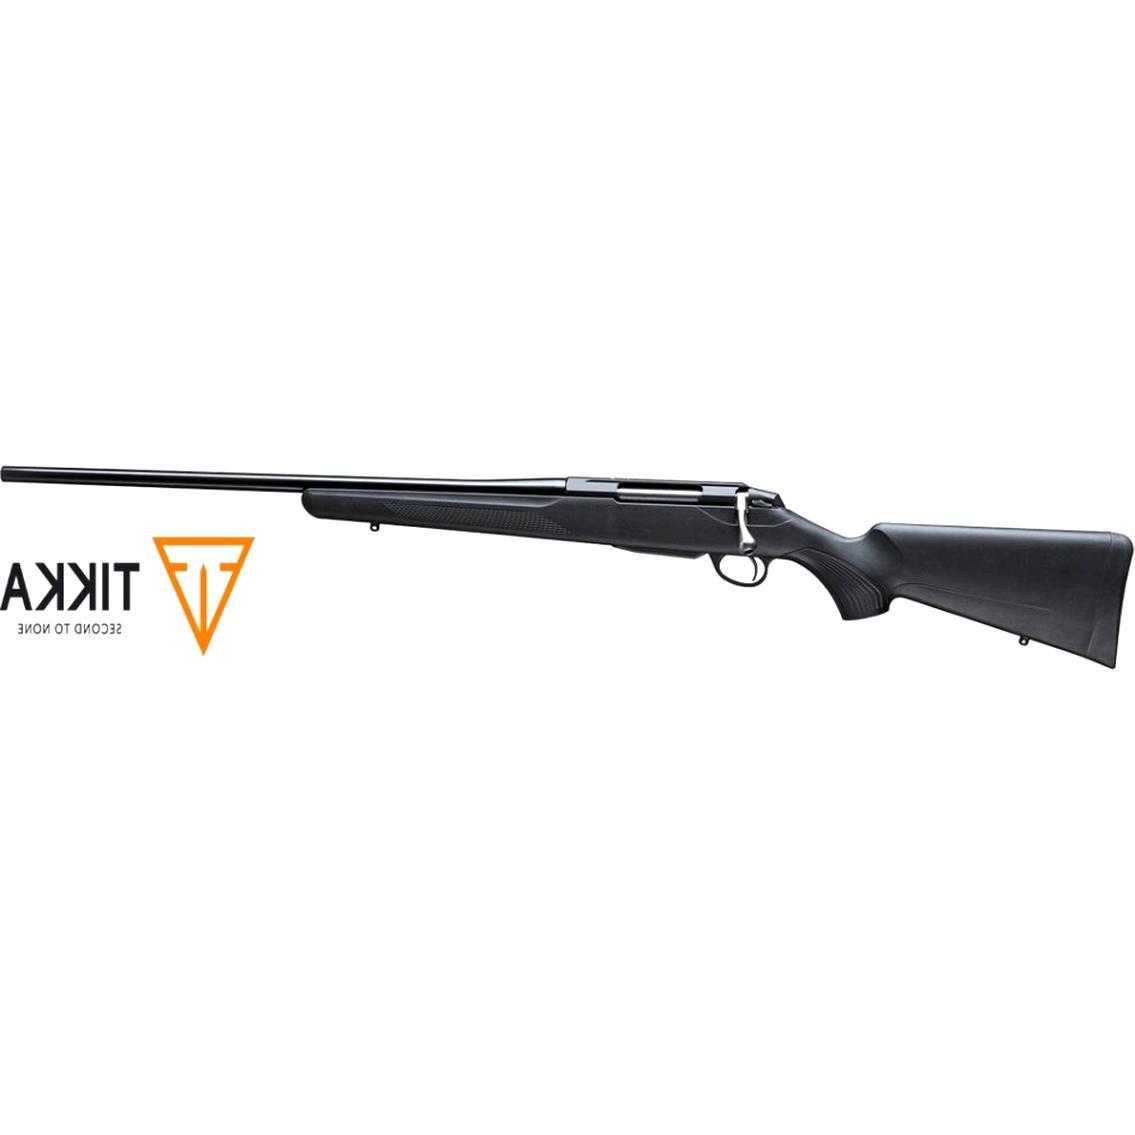 carabine 300 d'occasion